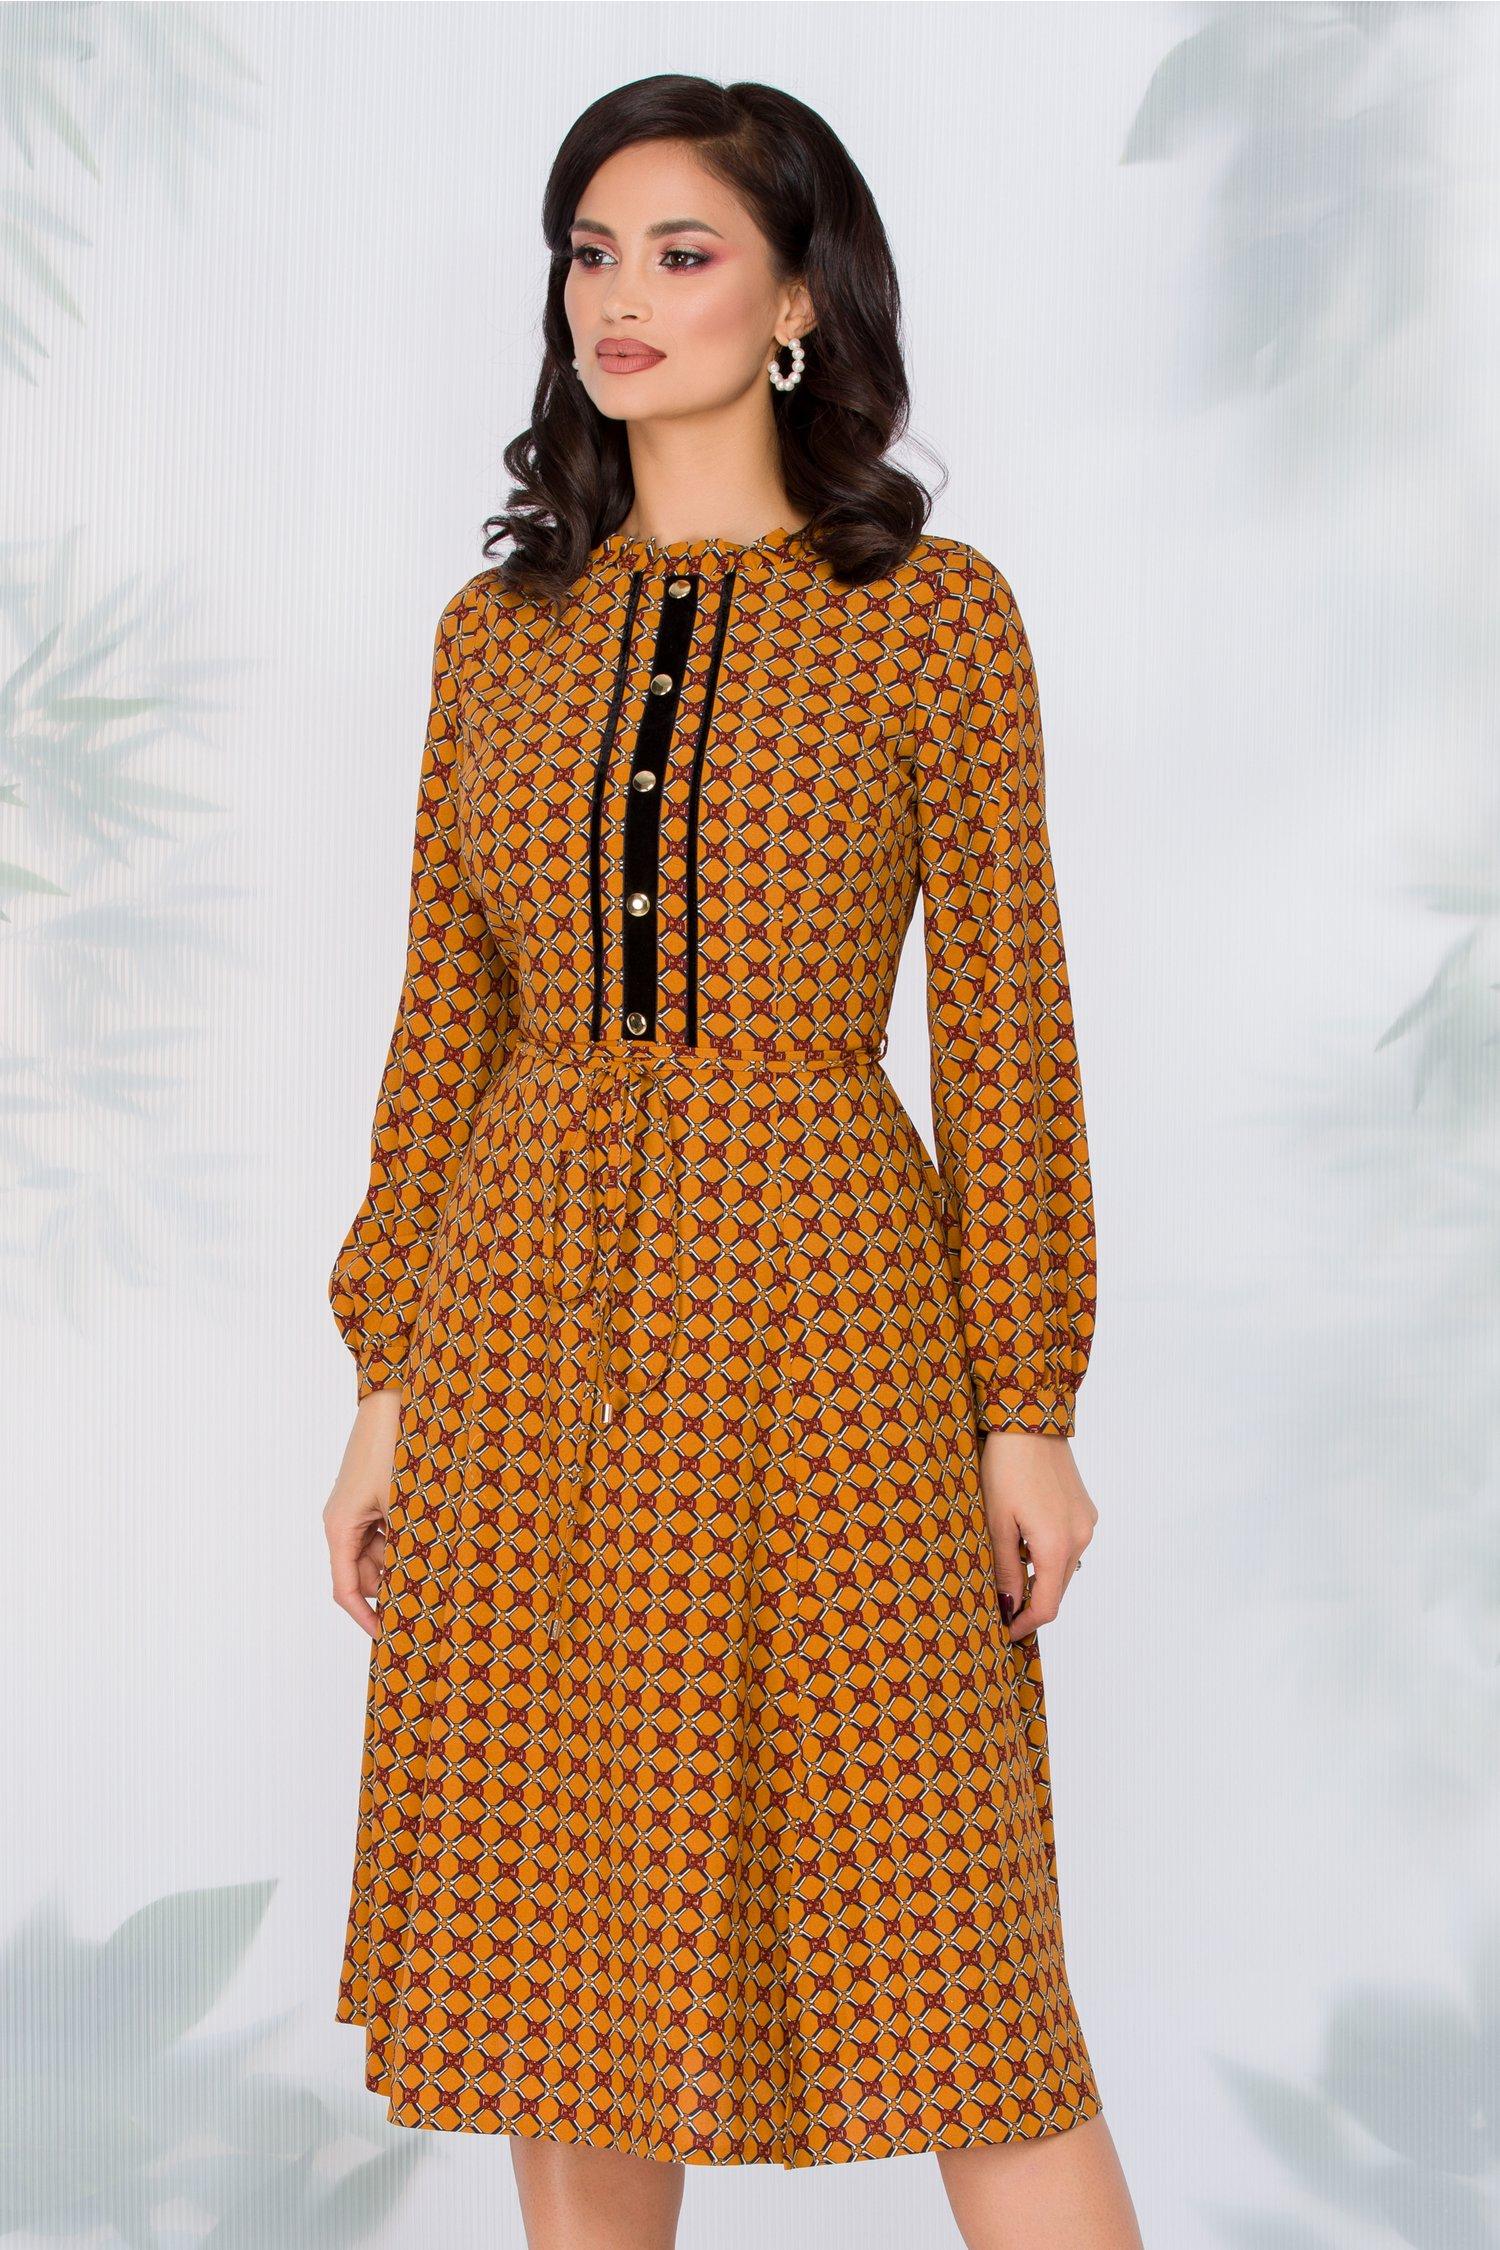 Rochie Leonard Collection maro cu imprimeu fashion